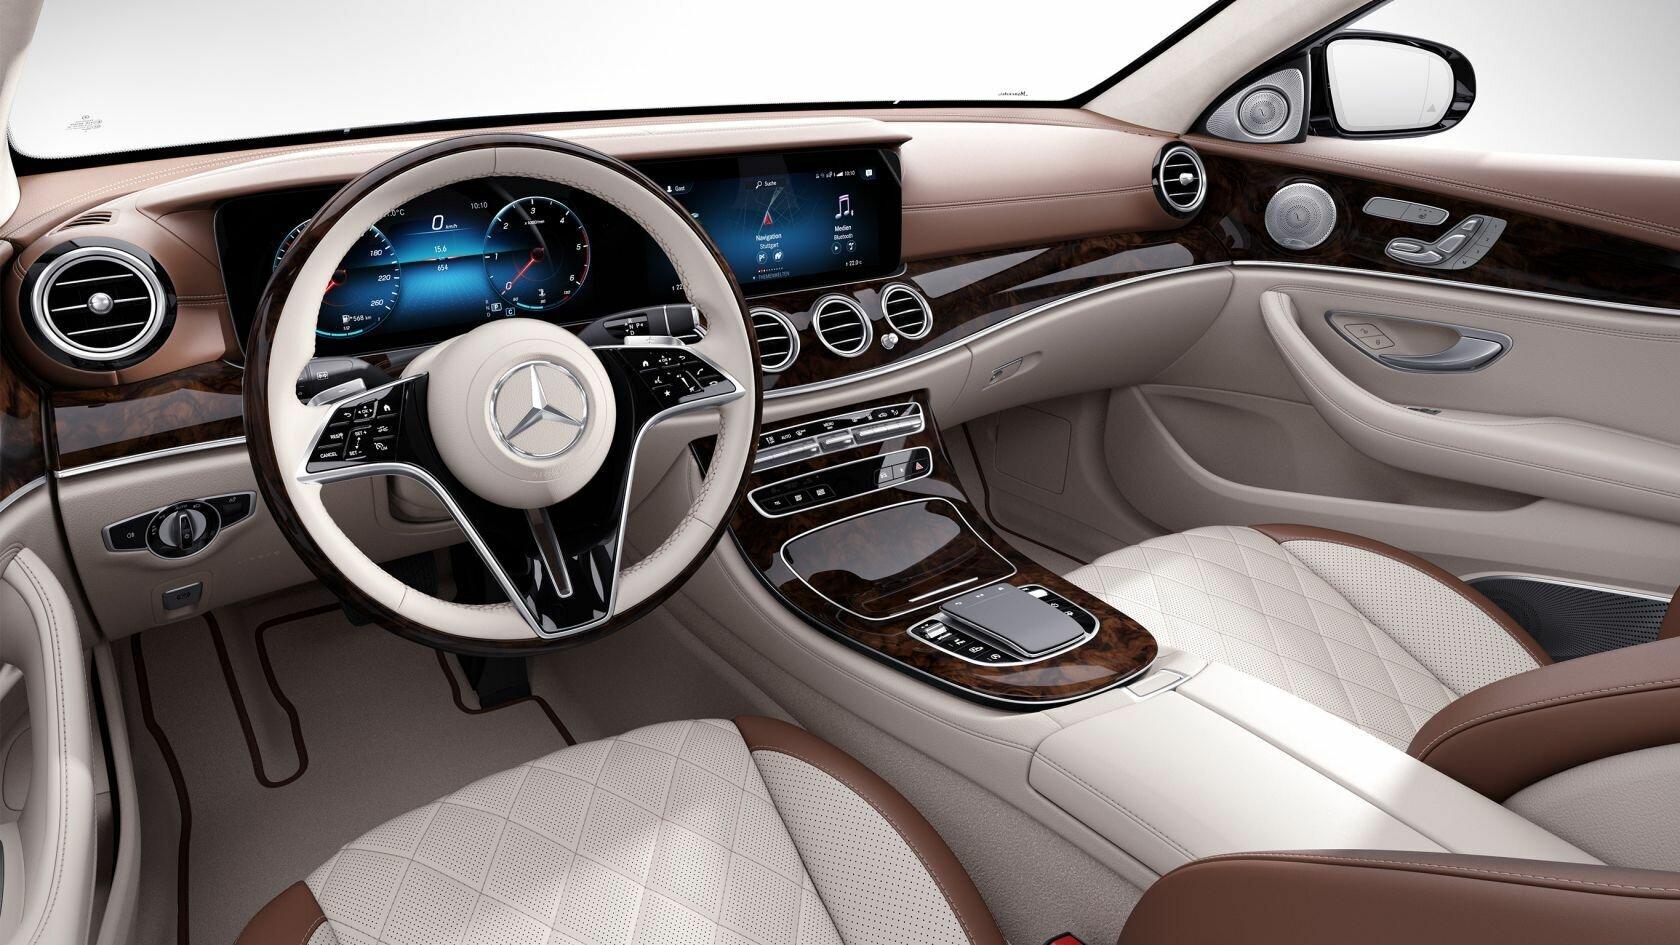 Mercedes-Benz создали ароматическую систему